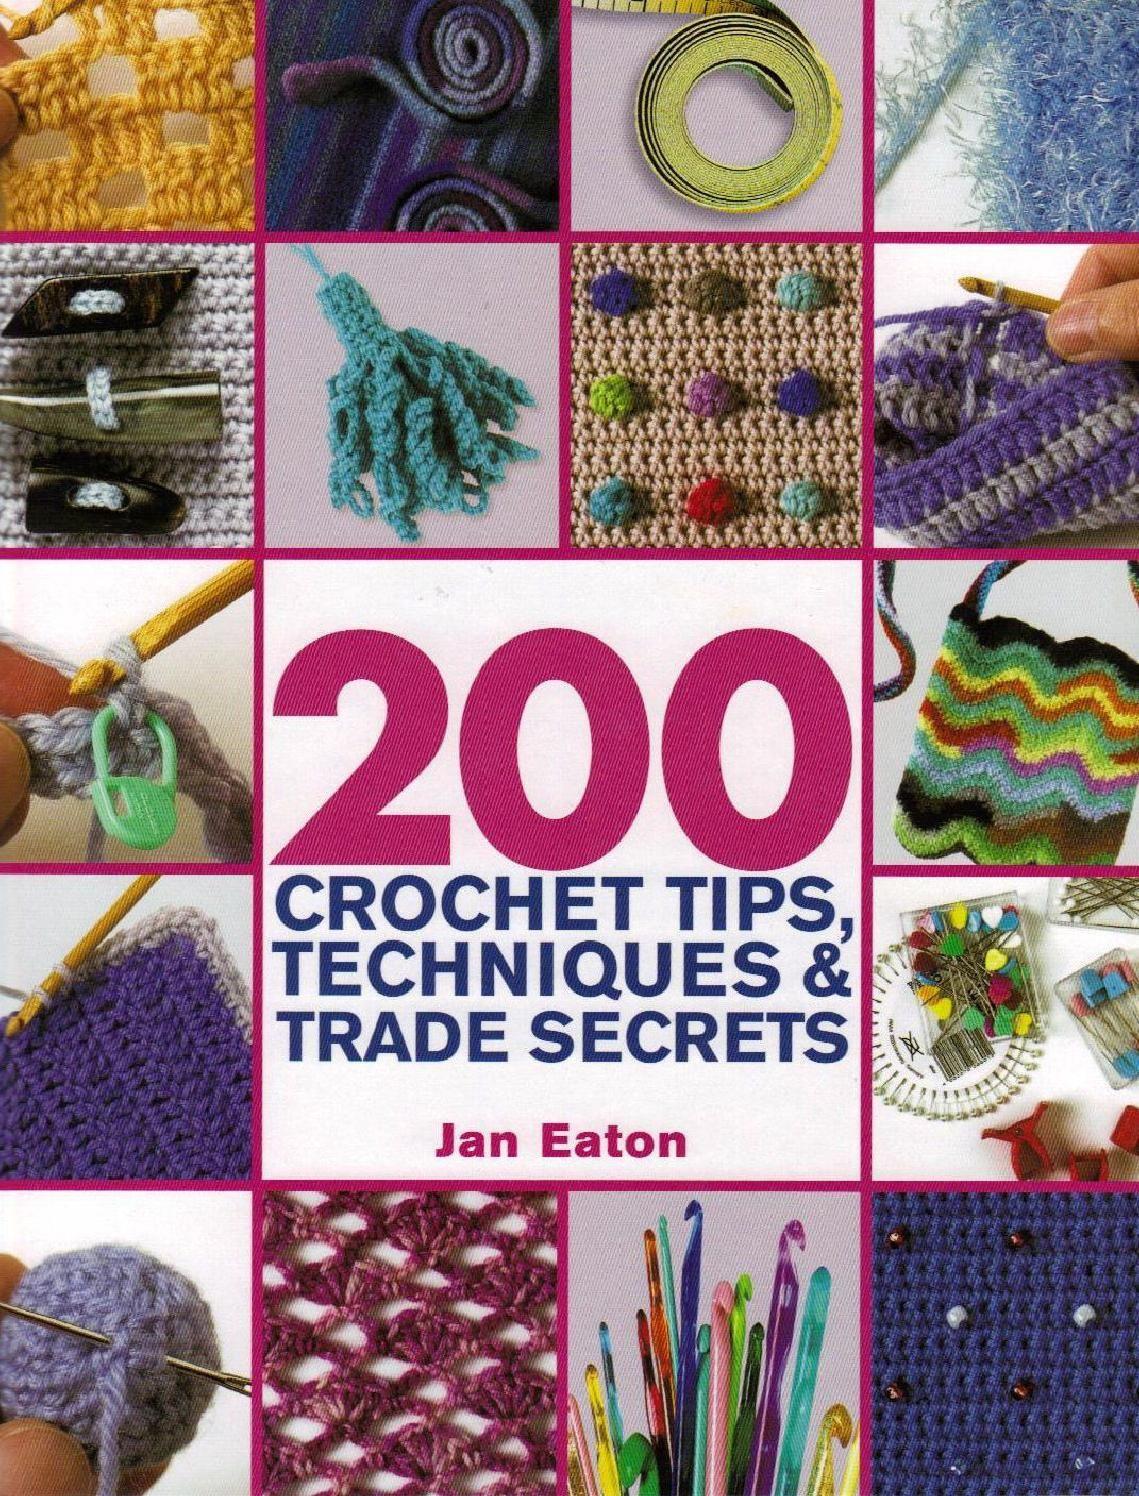 200 crochet tips,techniques & trade secrets by jan eaton